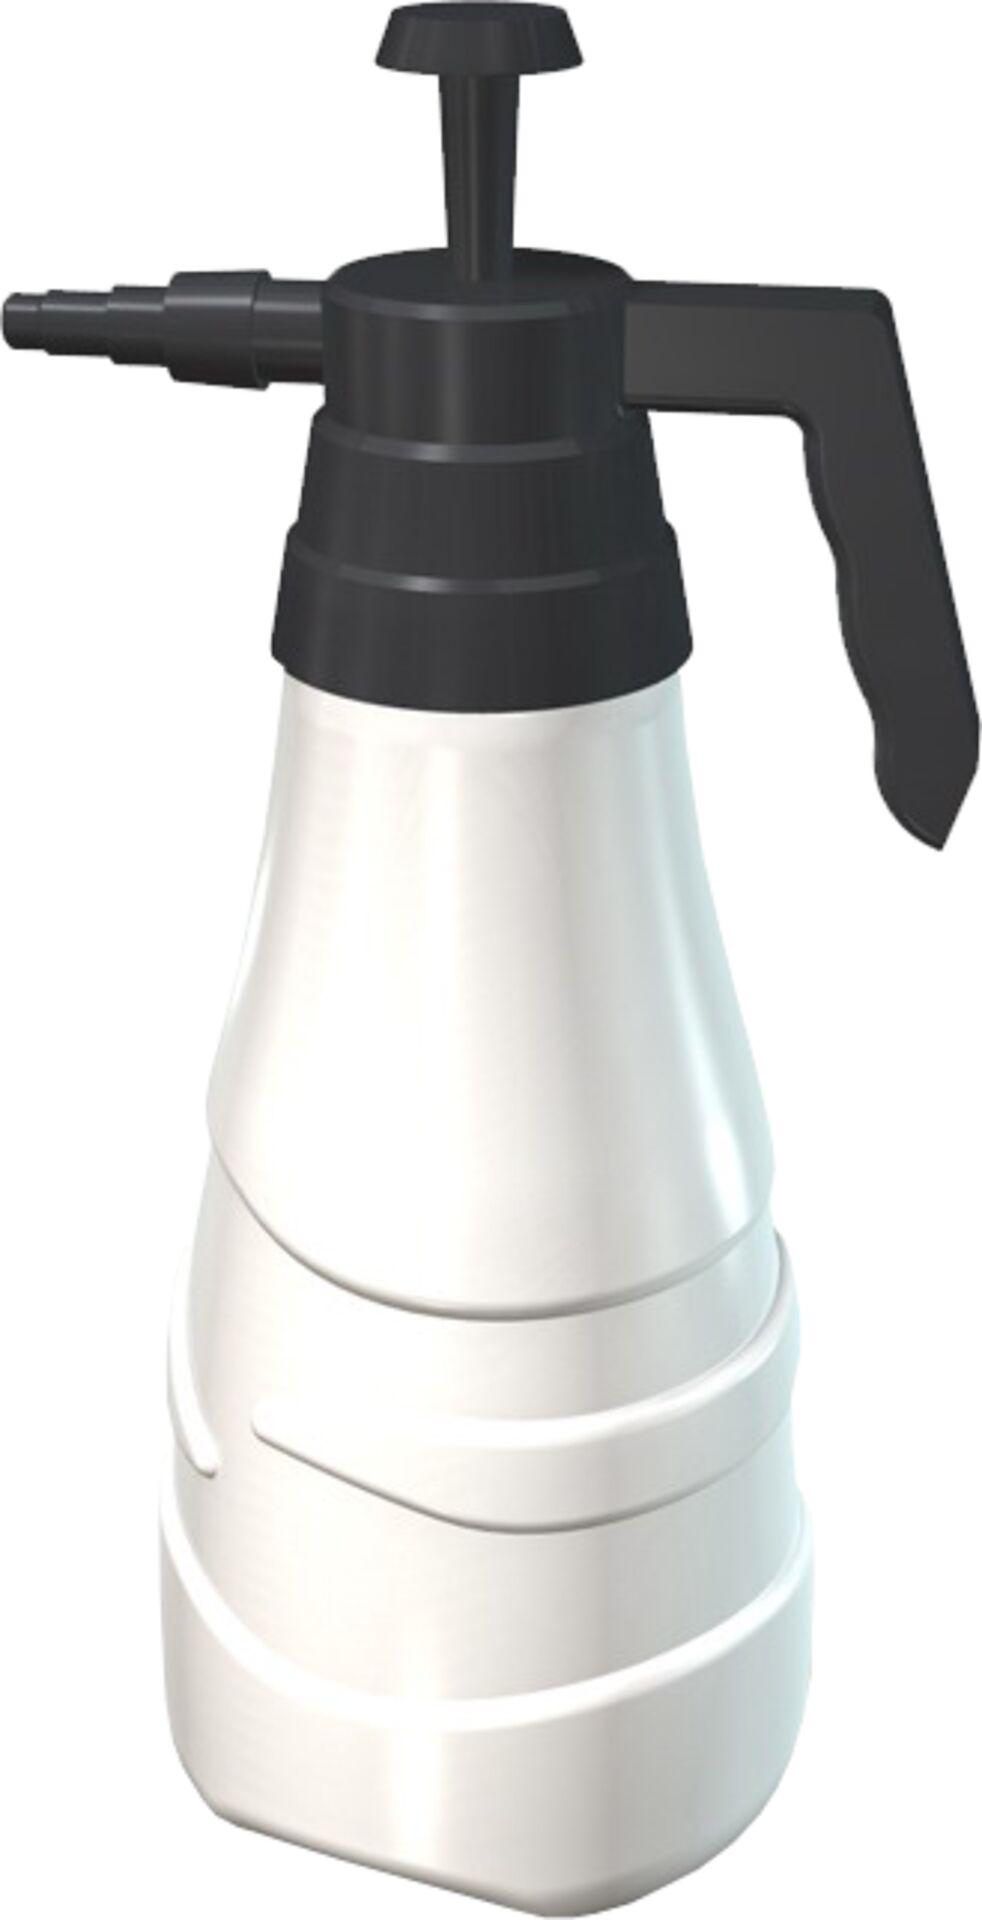 Rozprašovač LAGO tlakový 2,2l